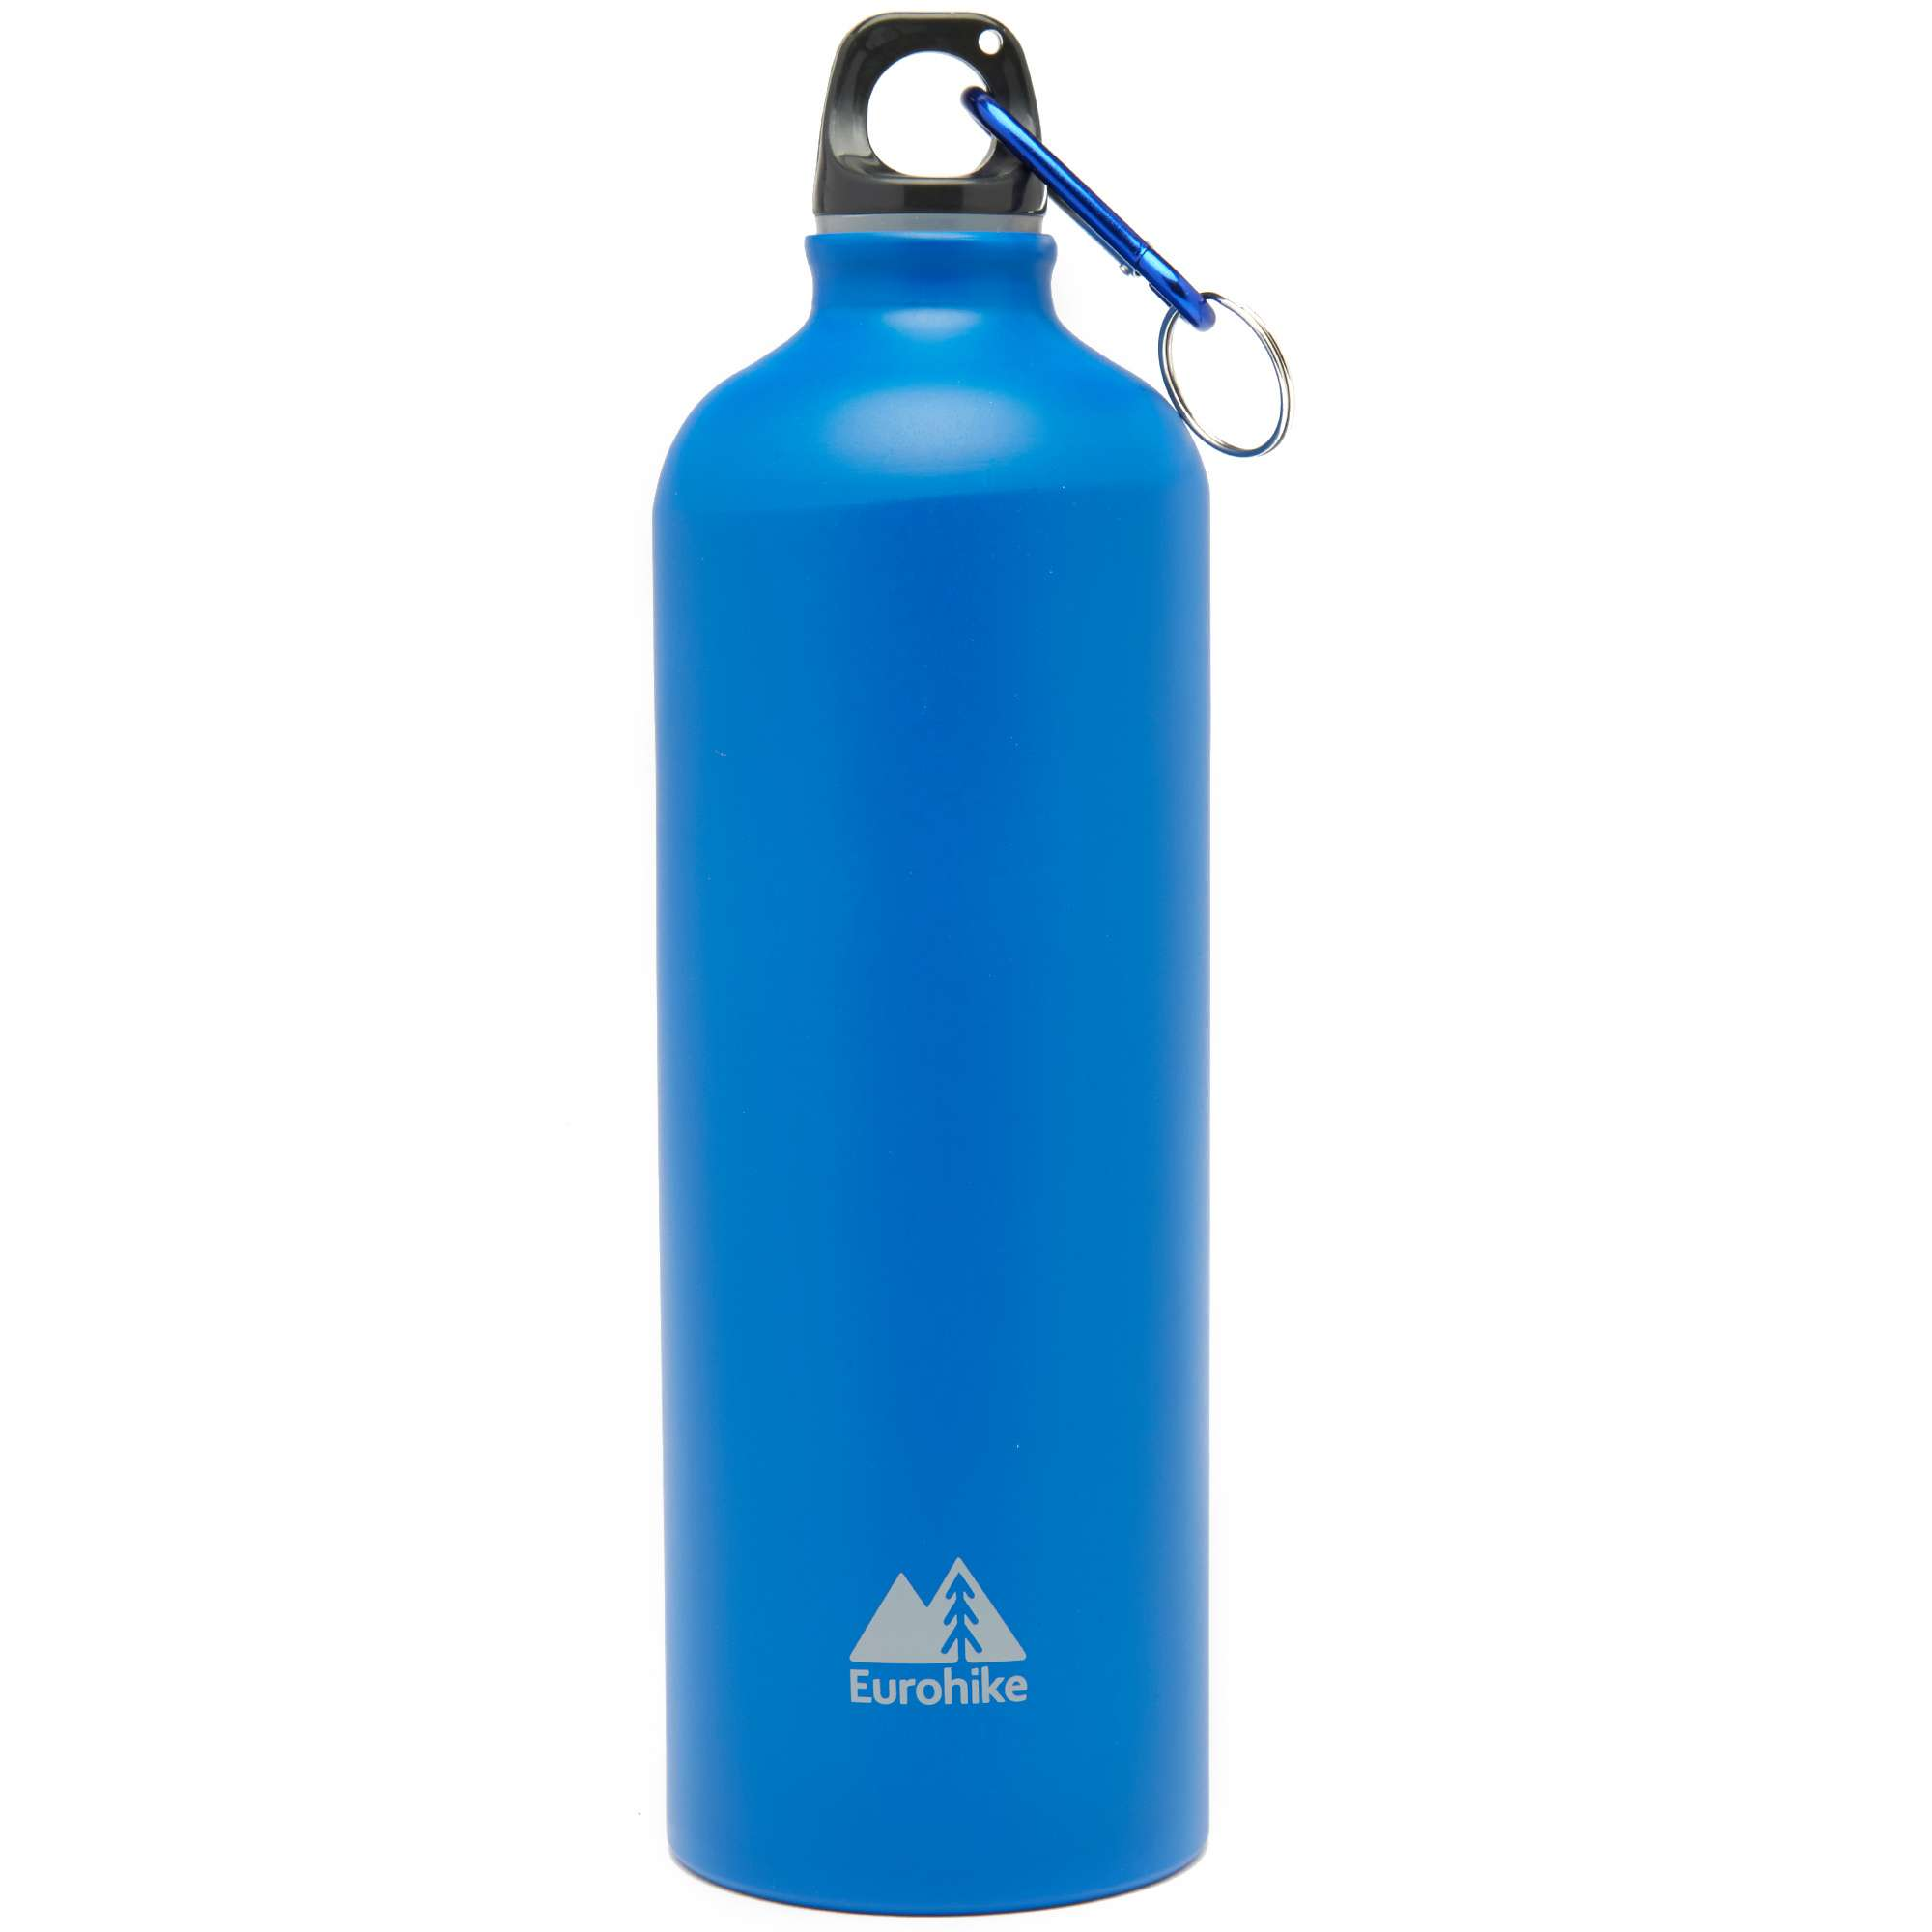 EUROHIKE Aqua 1L Aluminium Bottle